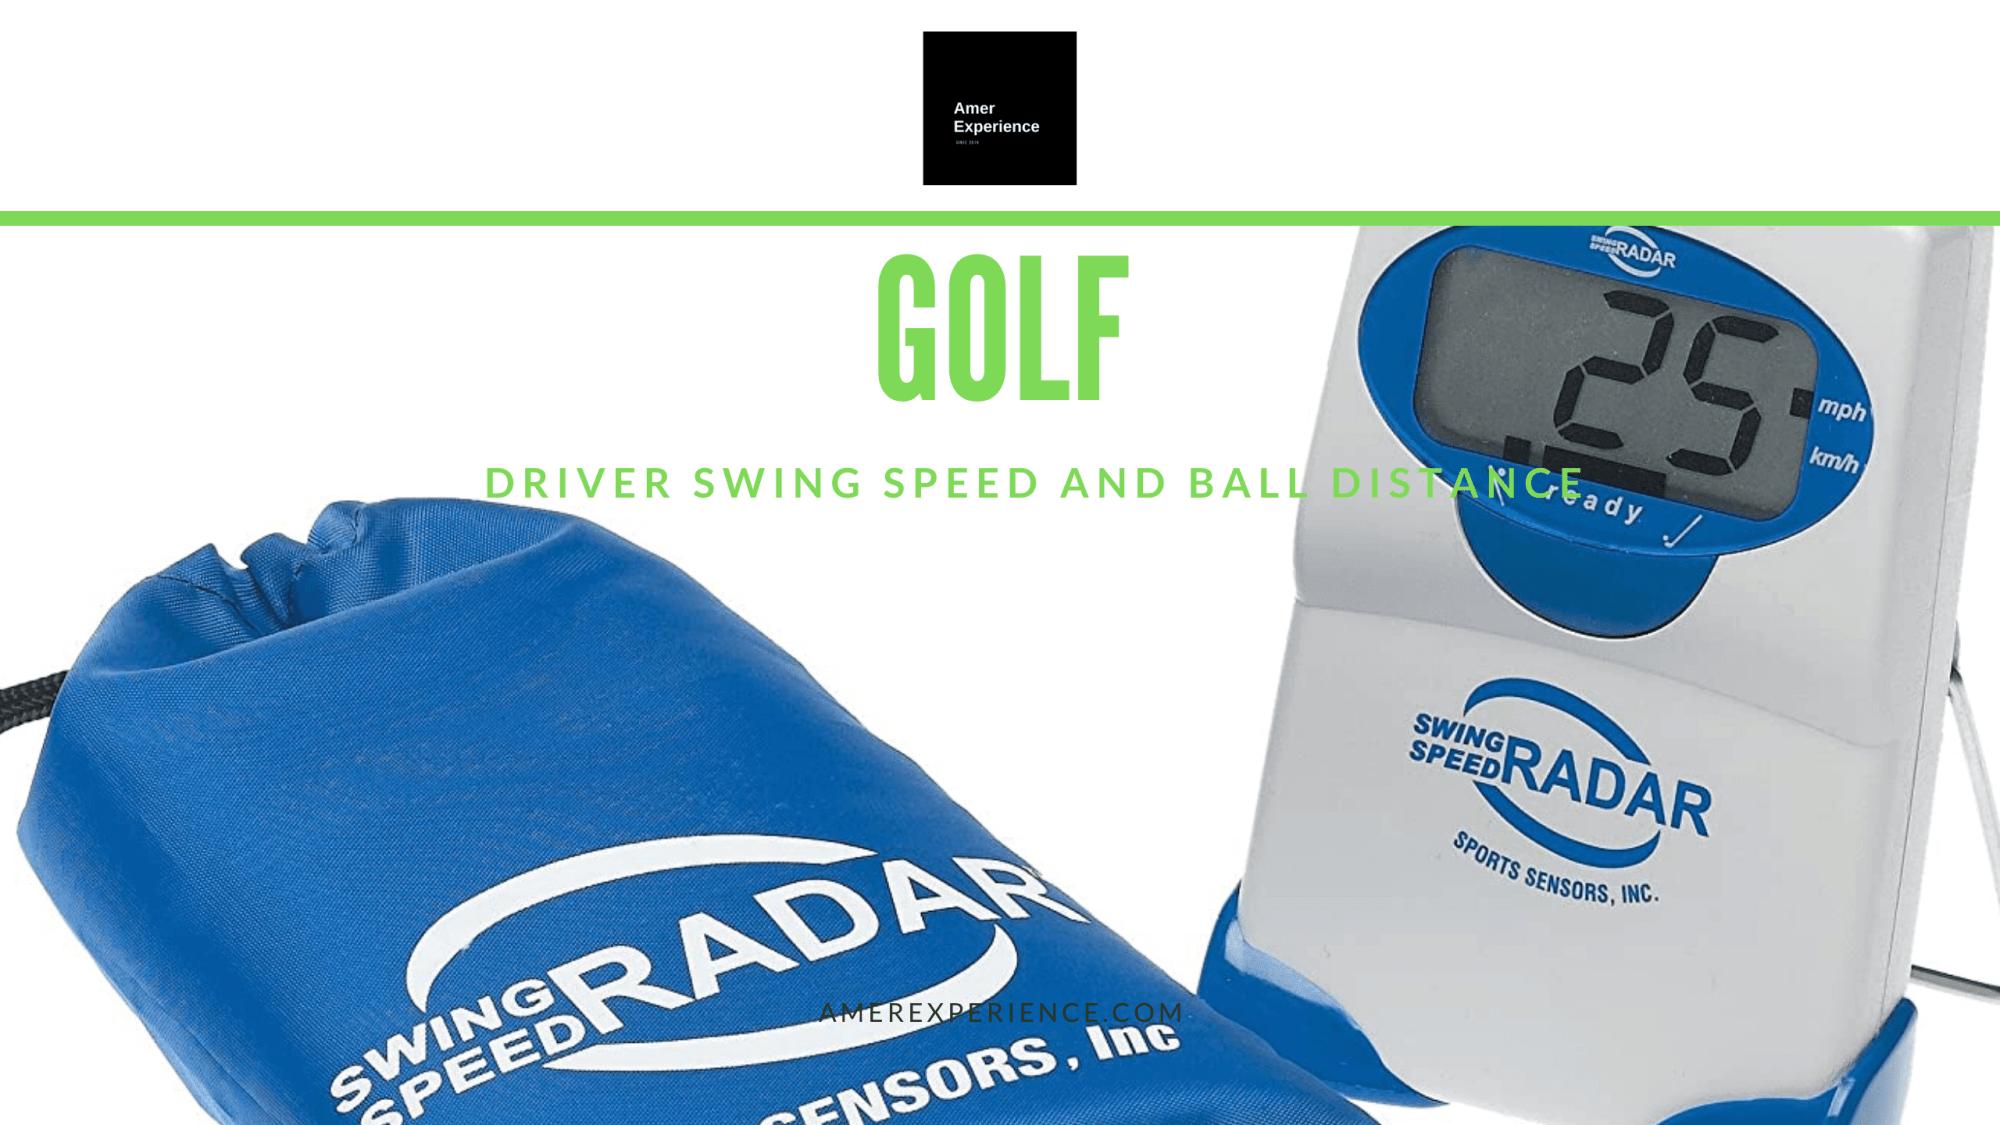 Golf Swing Speed Radar